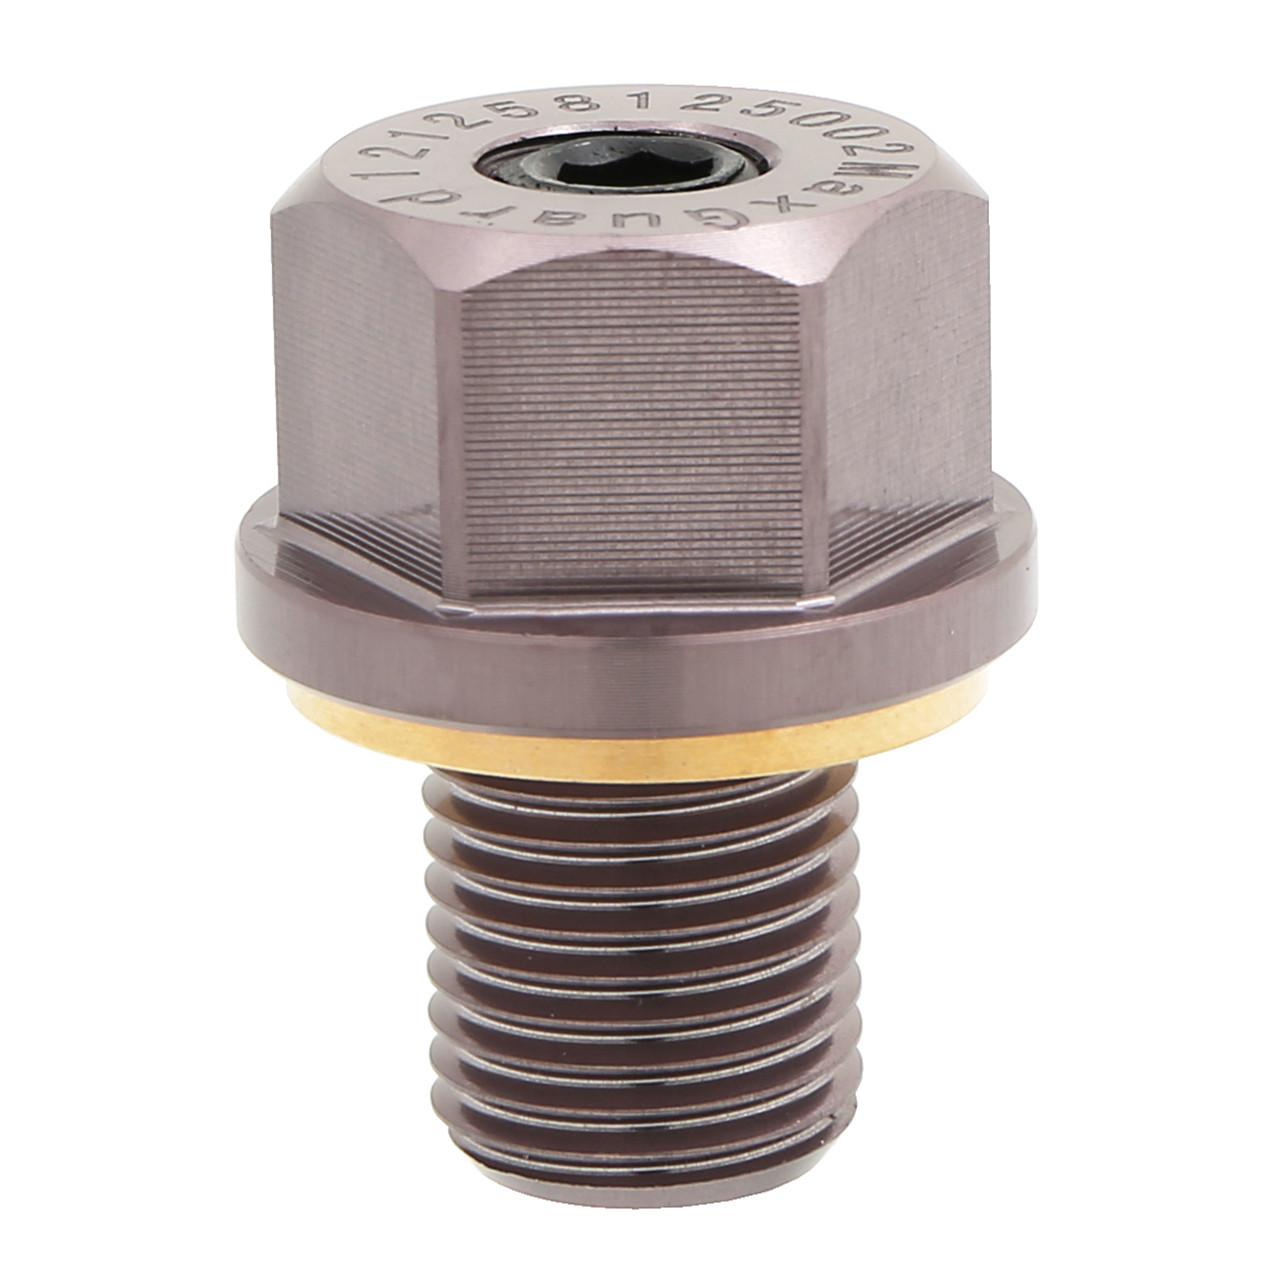 Navara Micra Maxima M12x1.25 BLUE Murano Magnetic Oil Sump Drain Plug